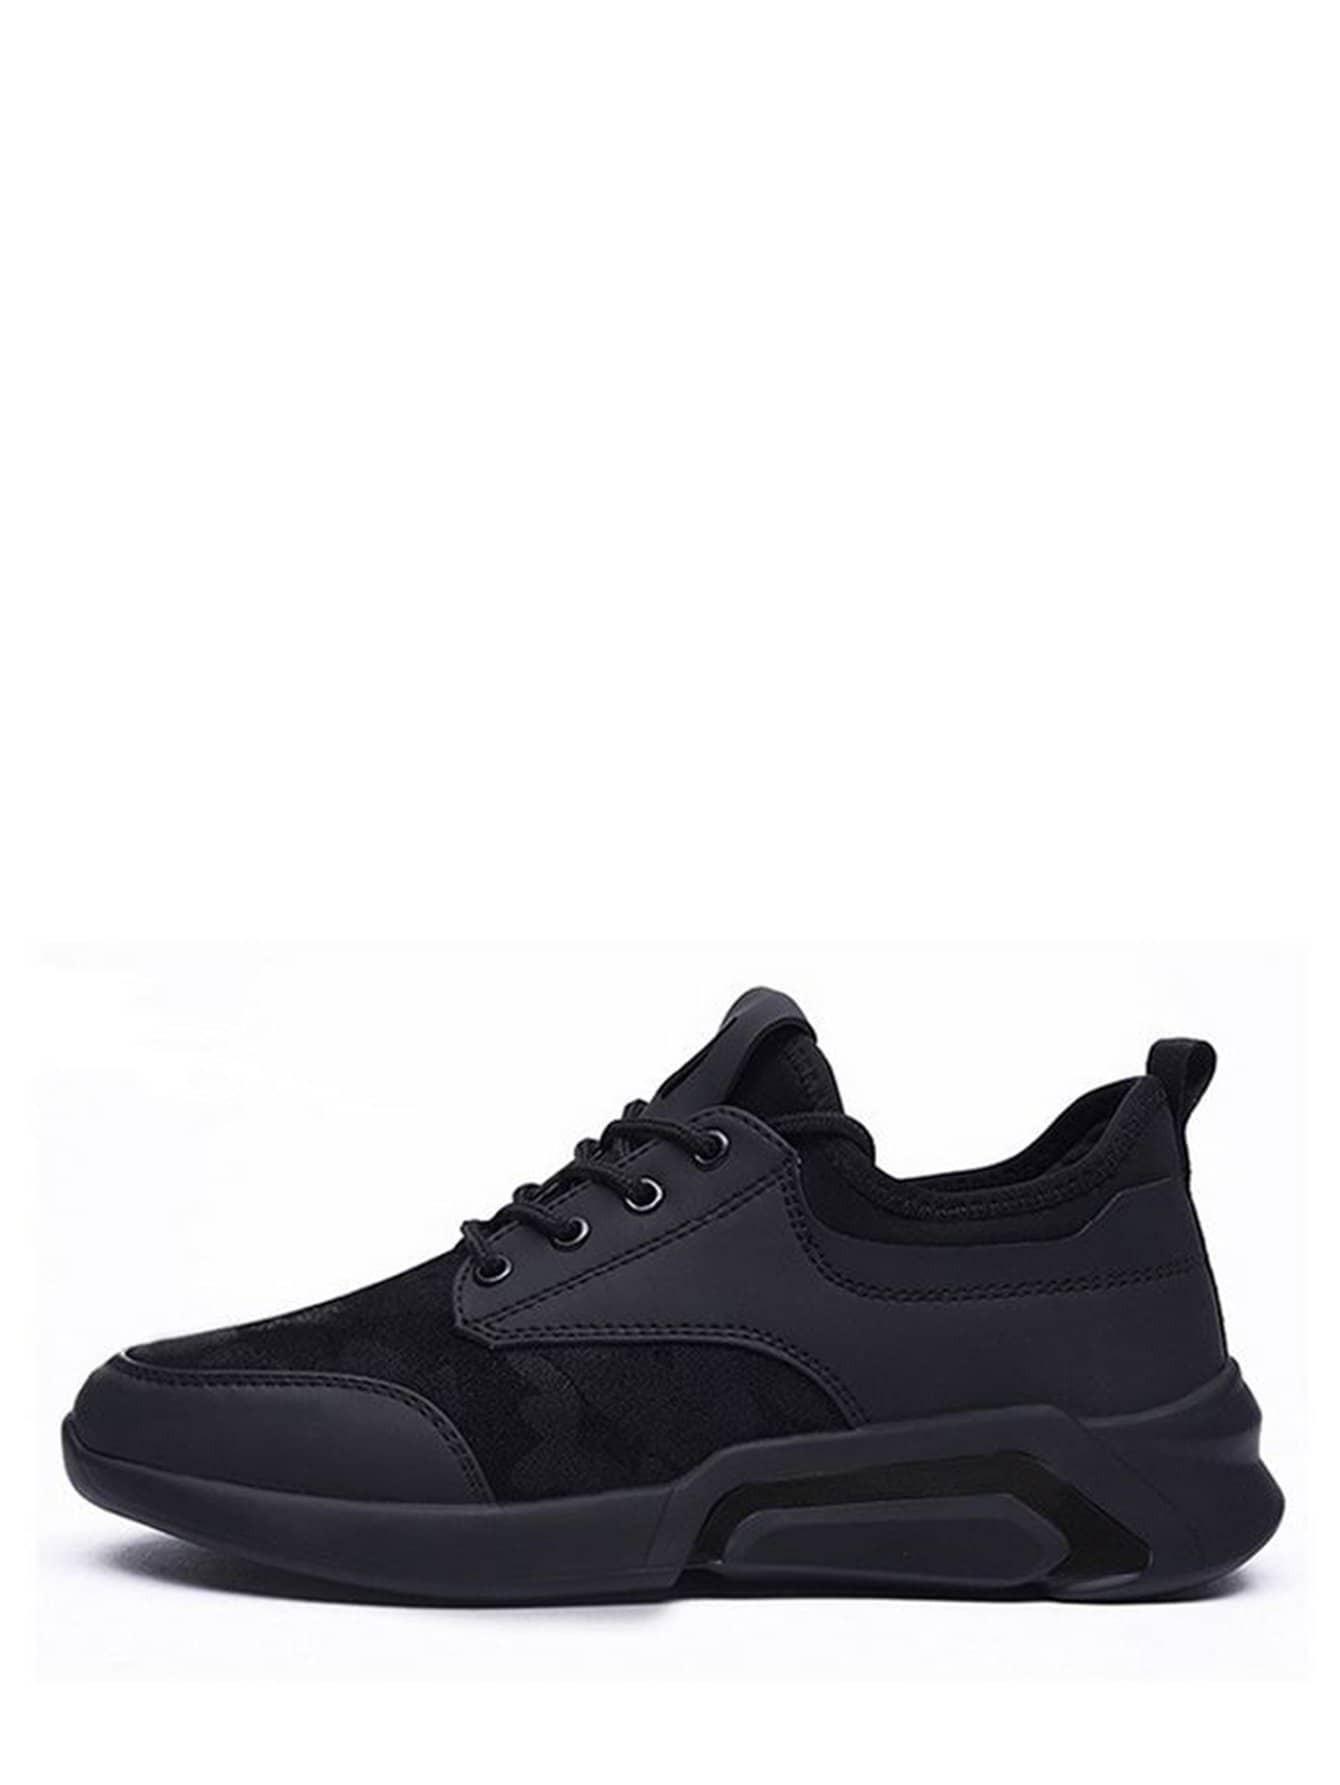 Men Lace Up Mesh Sneakers